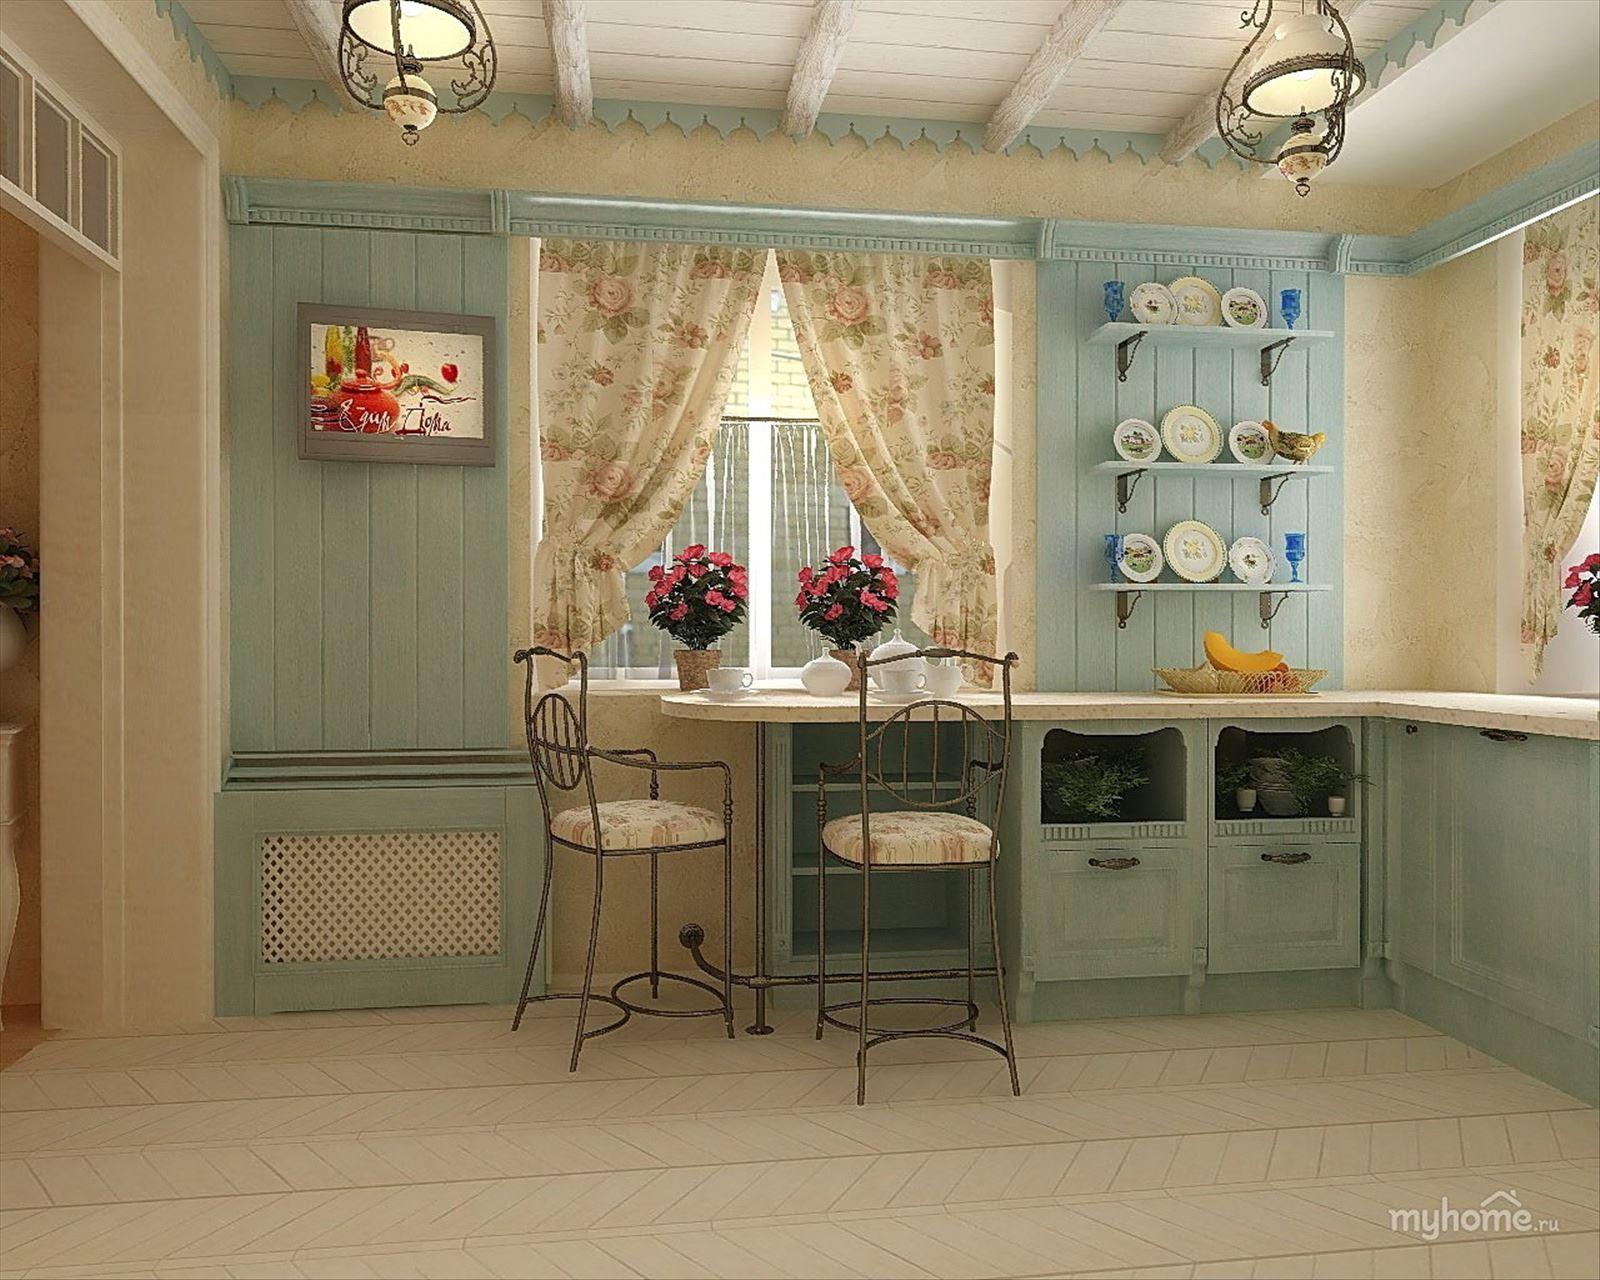 Кухня в стили прованс своими руками